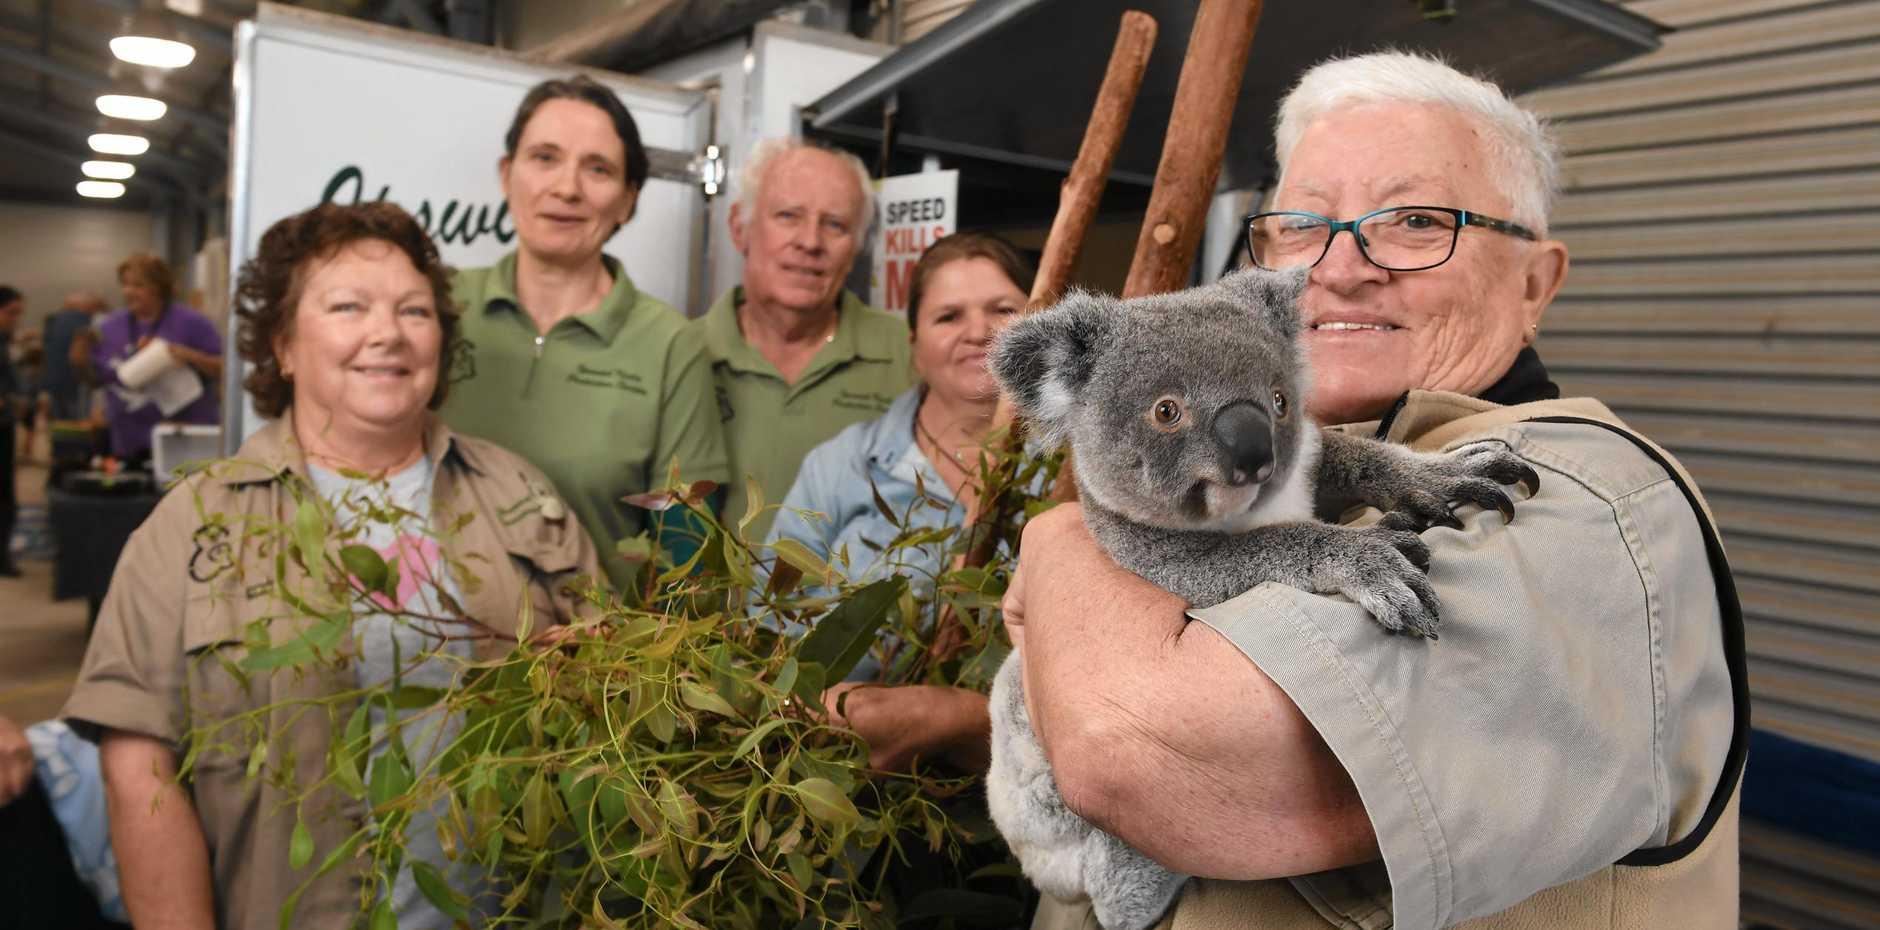 PROTECTORS: The Ipswich Koala Protection Society is celebrating its 25th anniversary. Members Maureen Hall, Dr Rebecca Larkin, Steve Hall and Marilyn Spletter with Kotoni the koala.